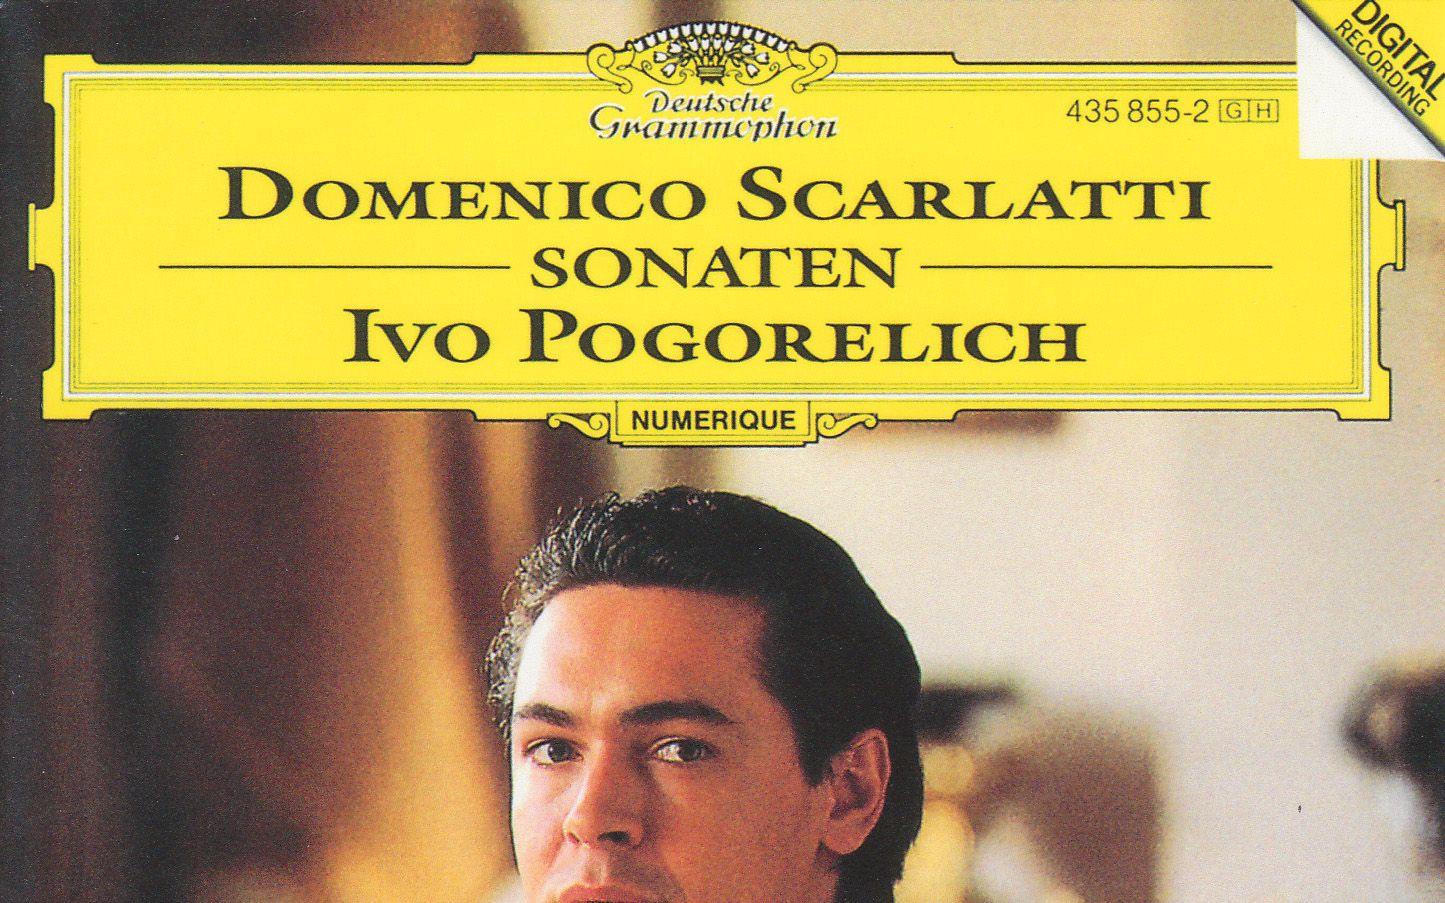 Ivo Pogorelich Scarlatti Sonatas 哔哩哔哩 つロ干杯 Bilibili